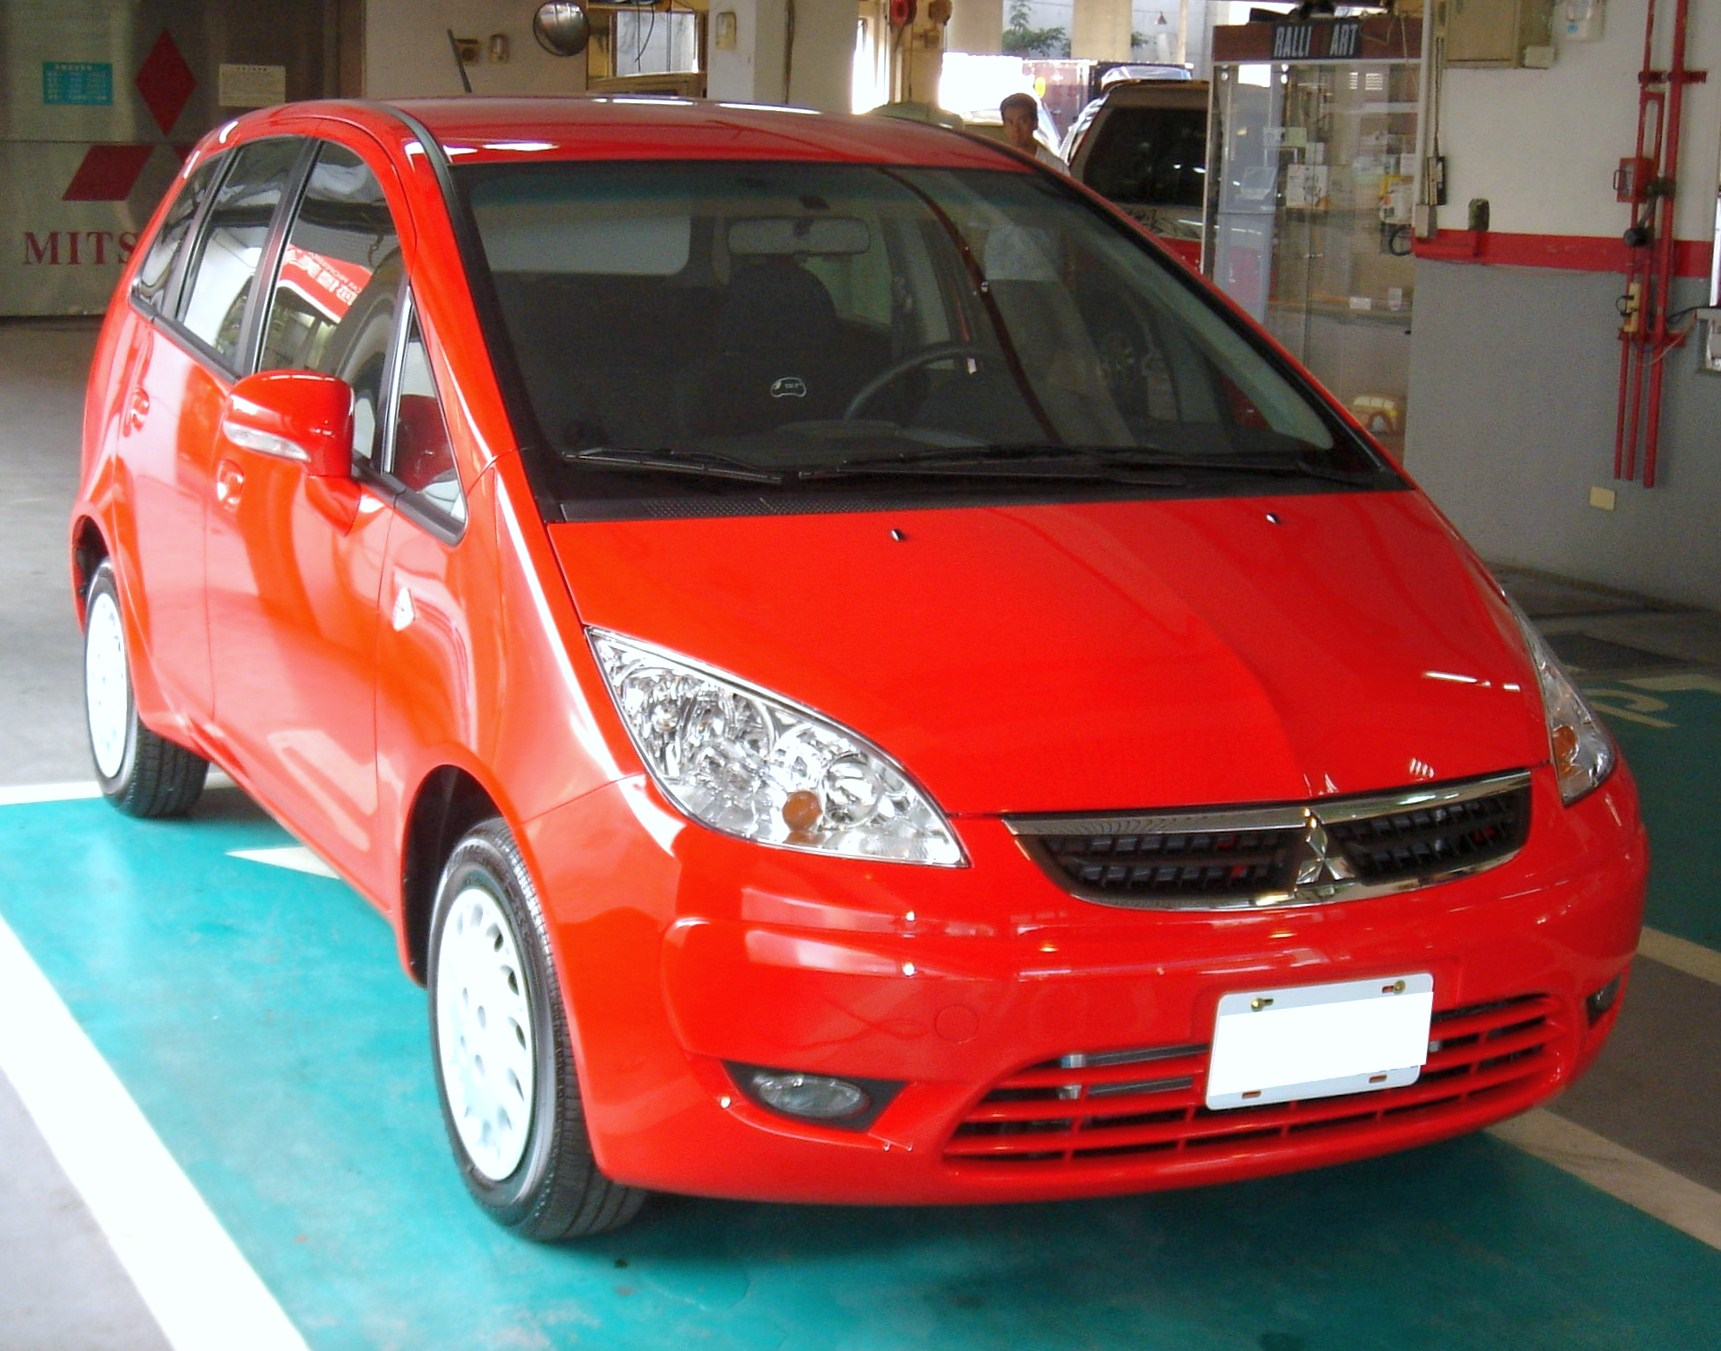 Mitsubishi Colt VI (Z30) 2002 - 2008 Station wagon 5 door #3